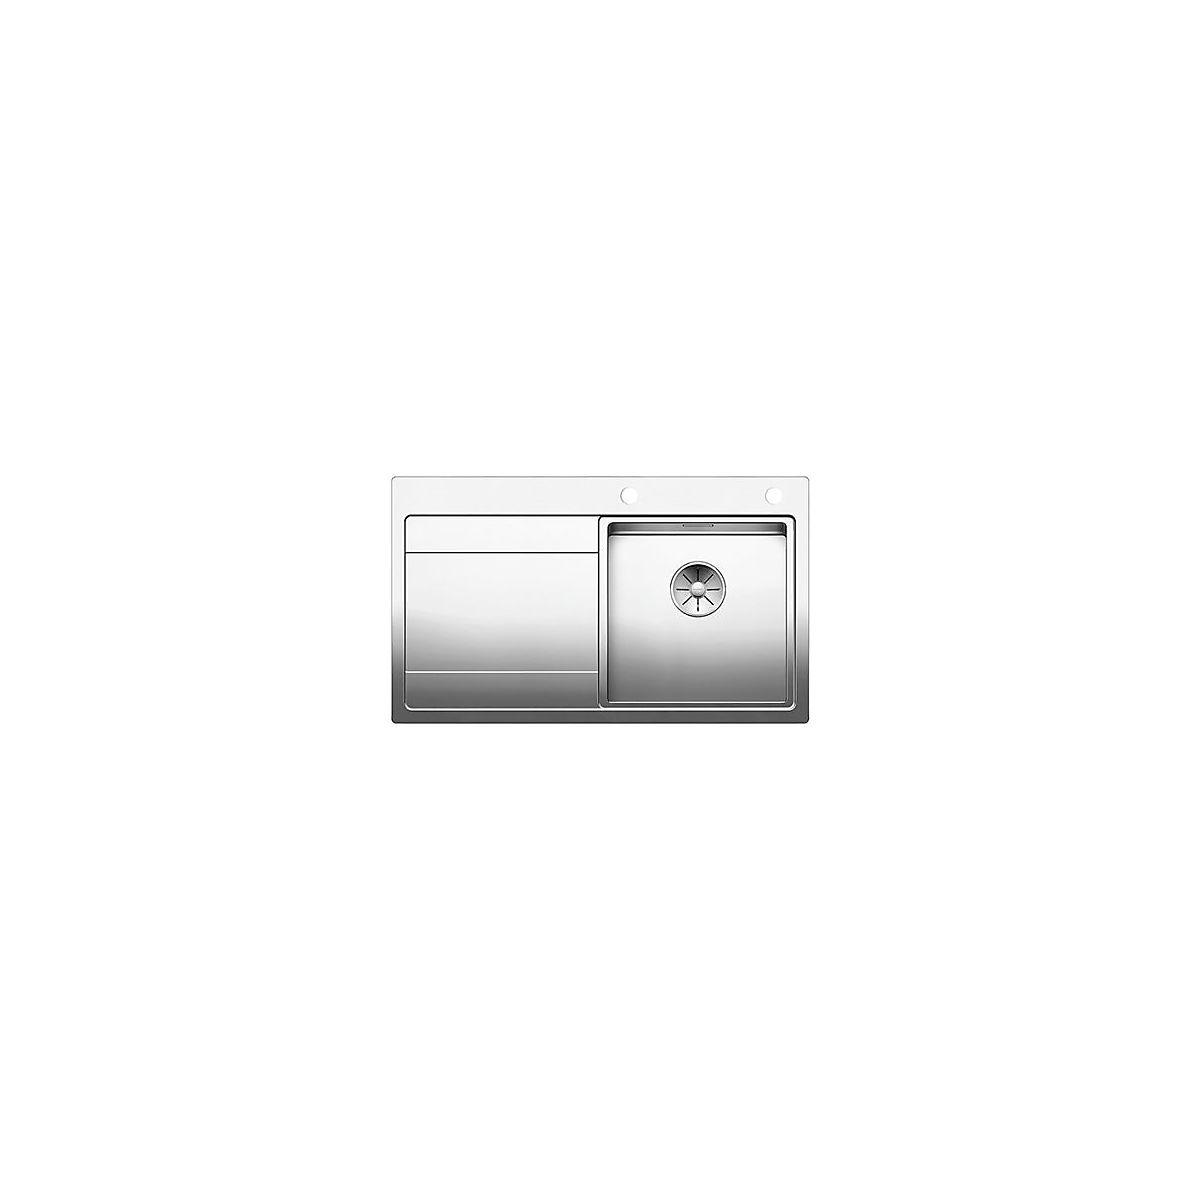 blanco divon ii 45 s if 860x510 mm kum h yre. Black Bedroom Furniture Sets. Home Design Ideas